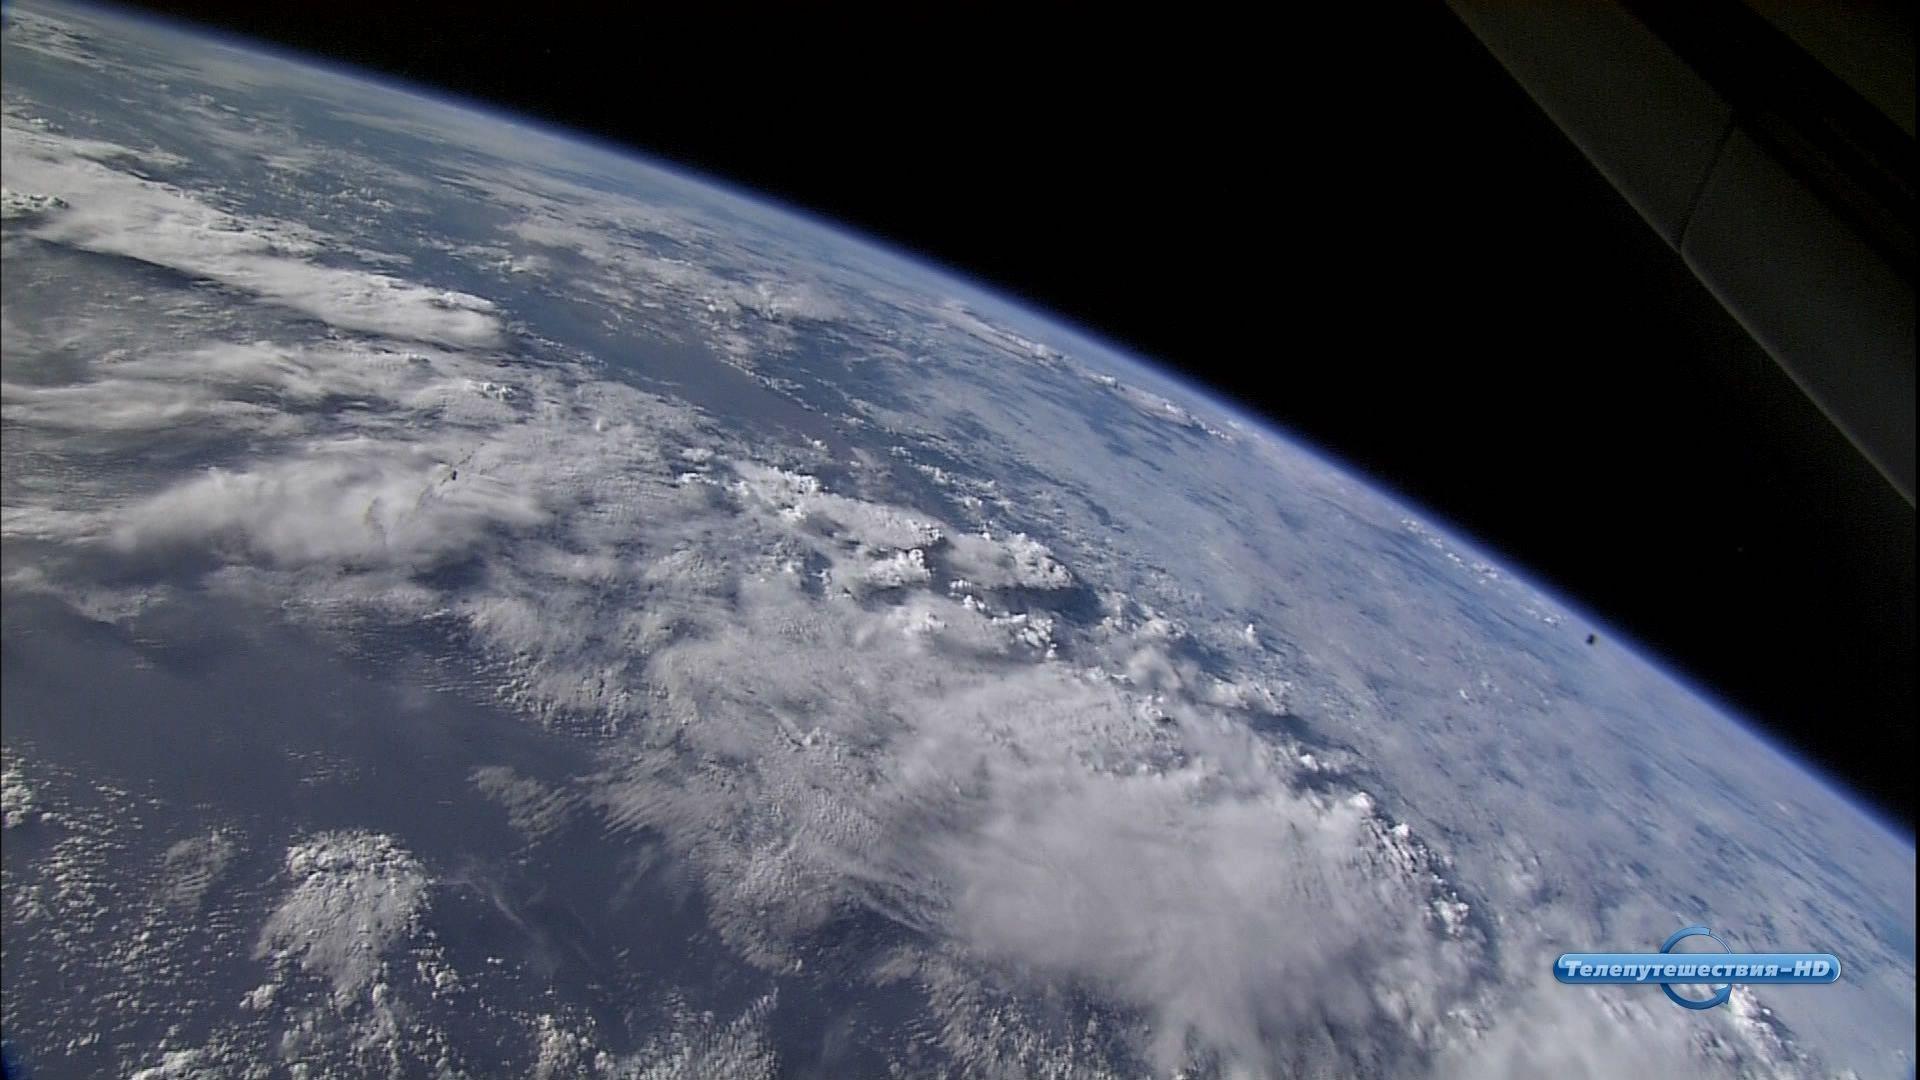 http://i1.imageban.ru/out/2011/02/03/62e087e281db8a2545a2f5349ac8d1d3.jpg